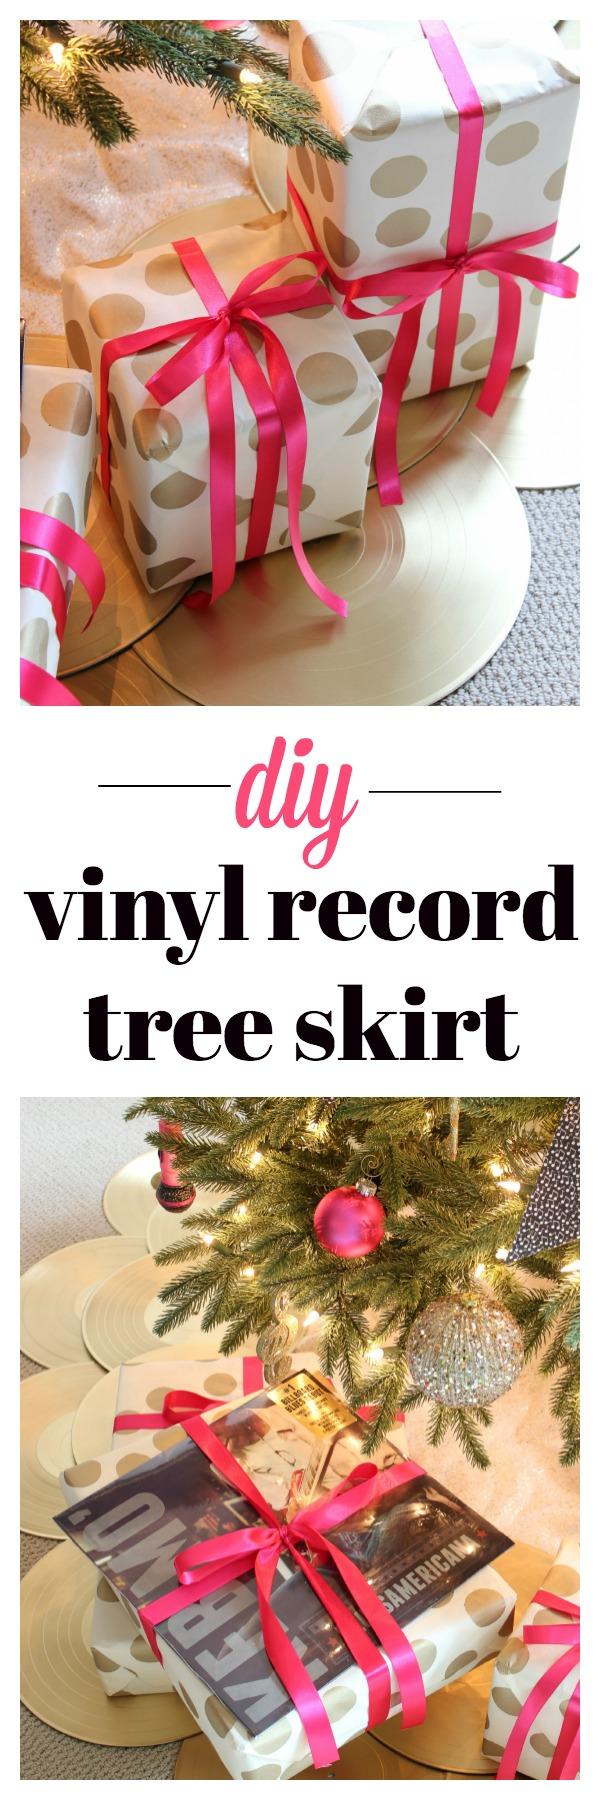 DIY Vinyl Record Christmas Tree Skirt | Christmas Tree Skirt Ideas | Christmas Tree Skirt DIY | How To Make a Christmas Tree Skirt